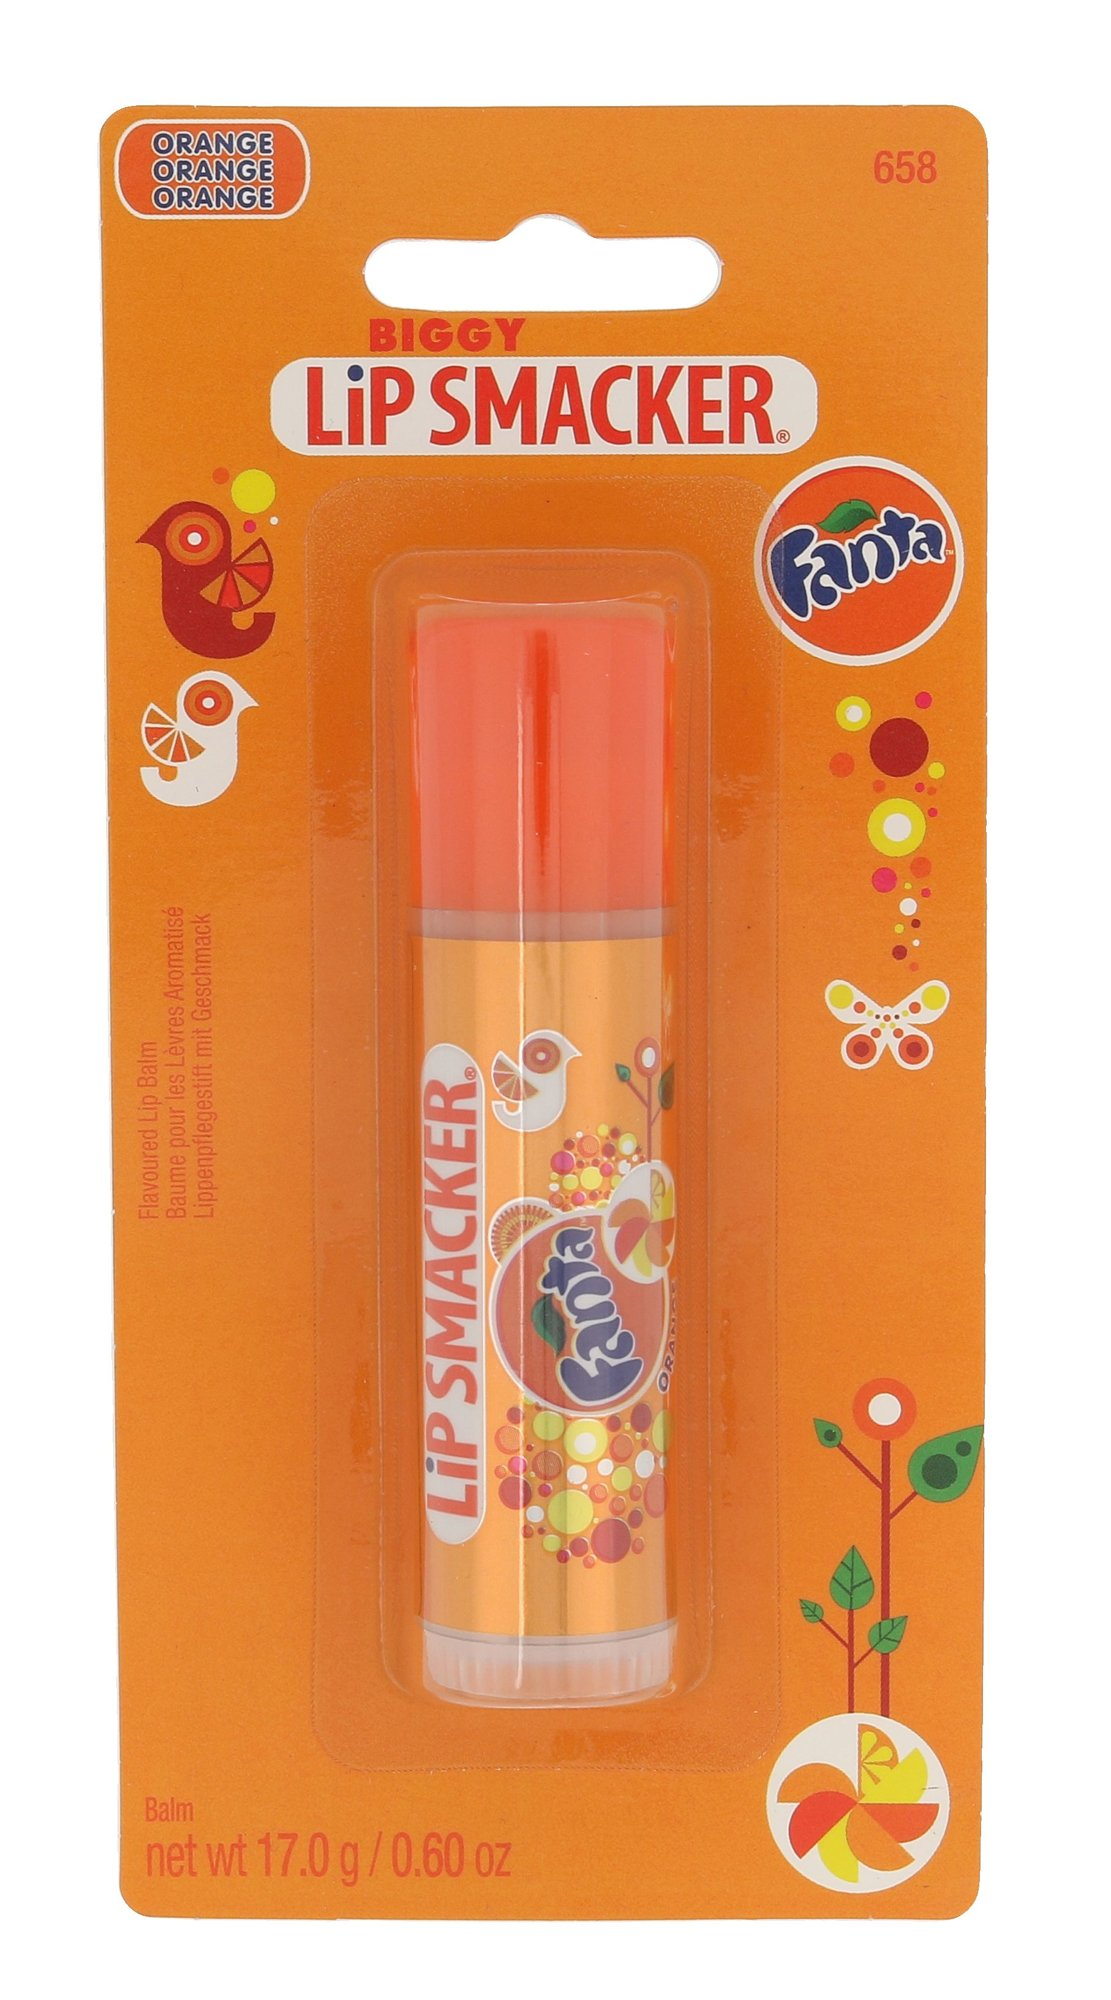 Lip Smacker Biggy Lip Balm Cosmetic 17ml